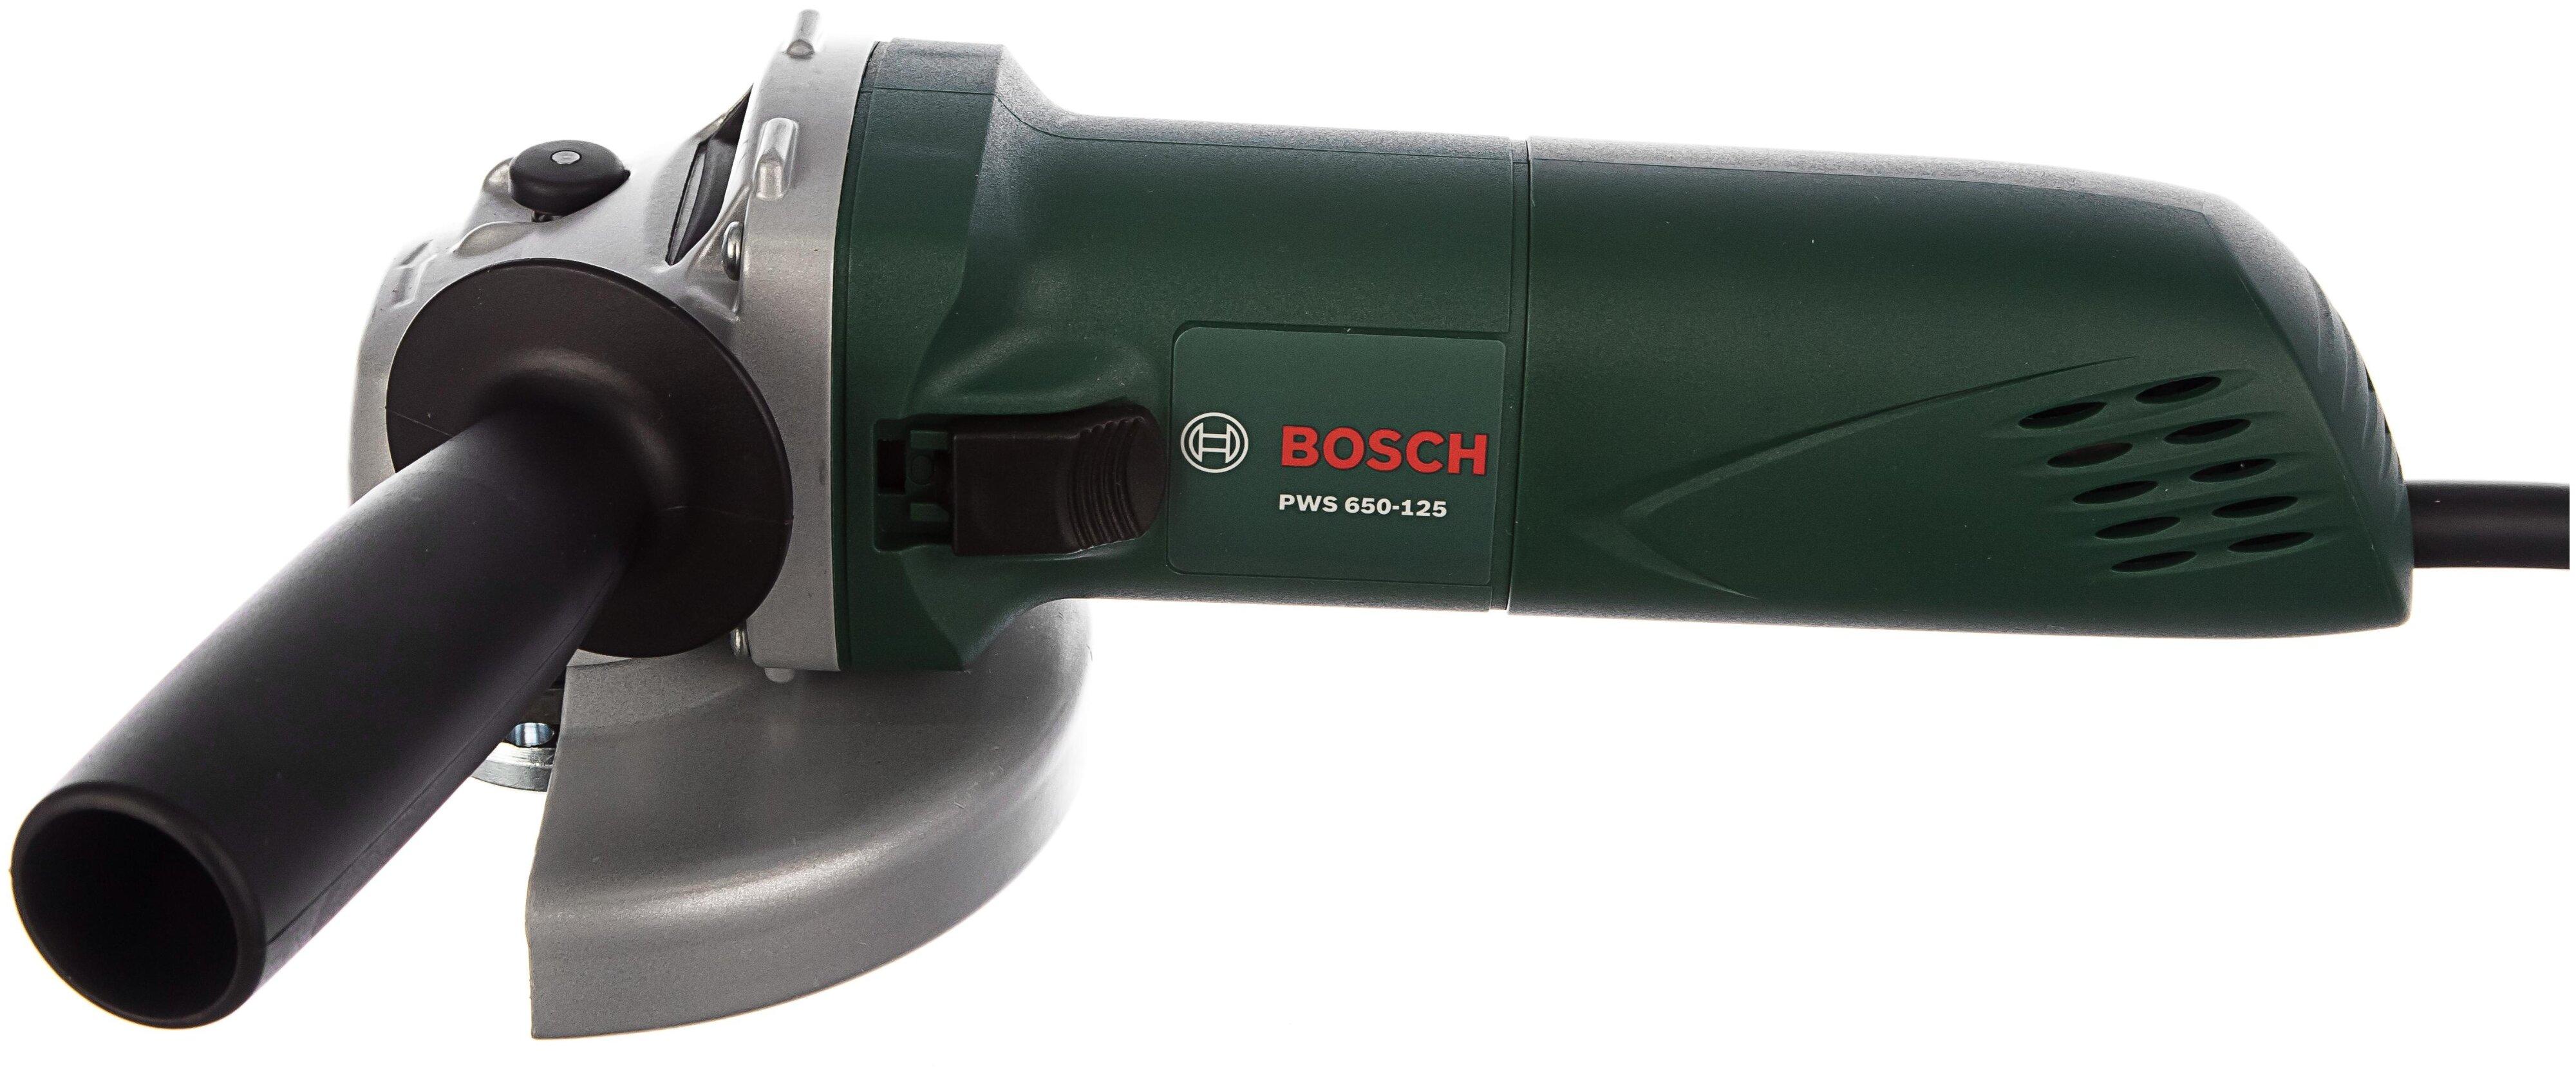 УШМ BOSCH PWS 650-125, 650 Вт, 125 мм